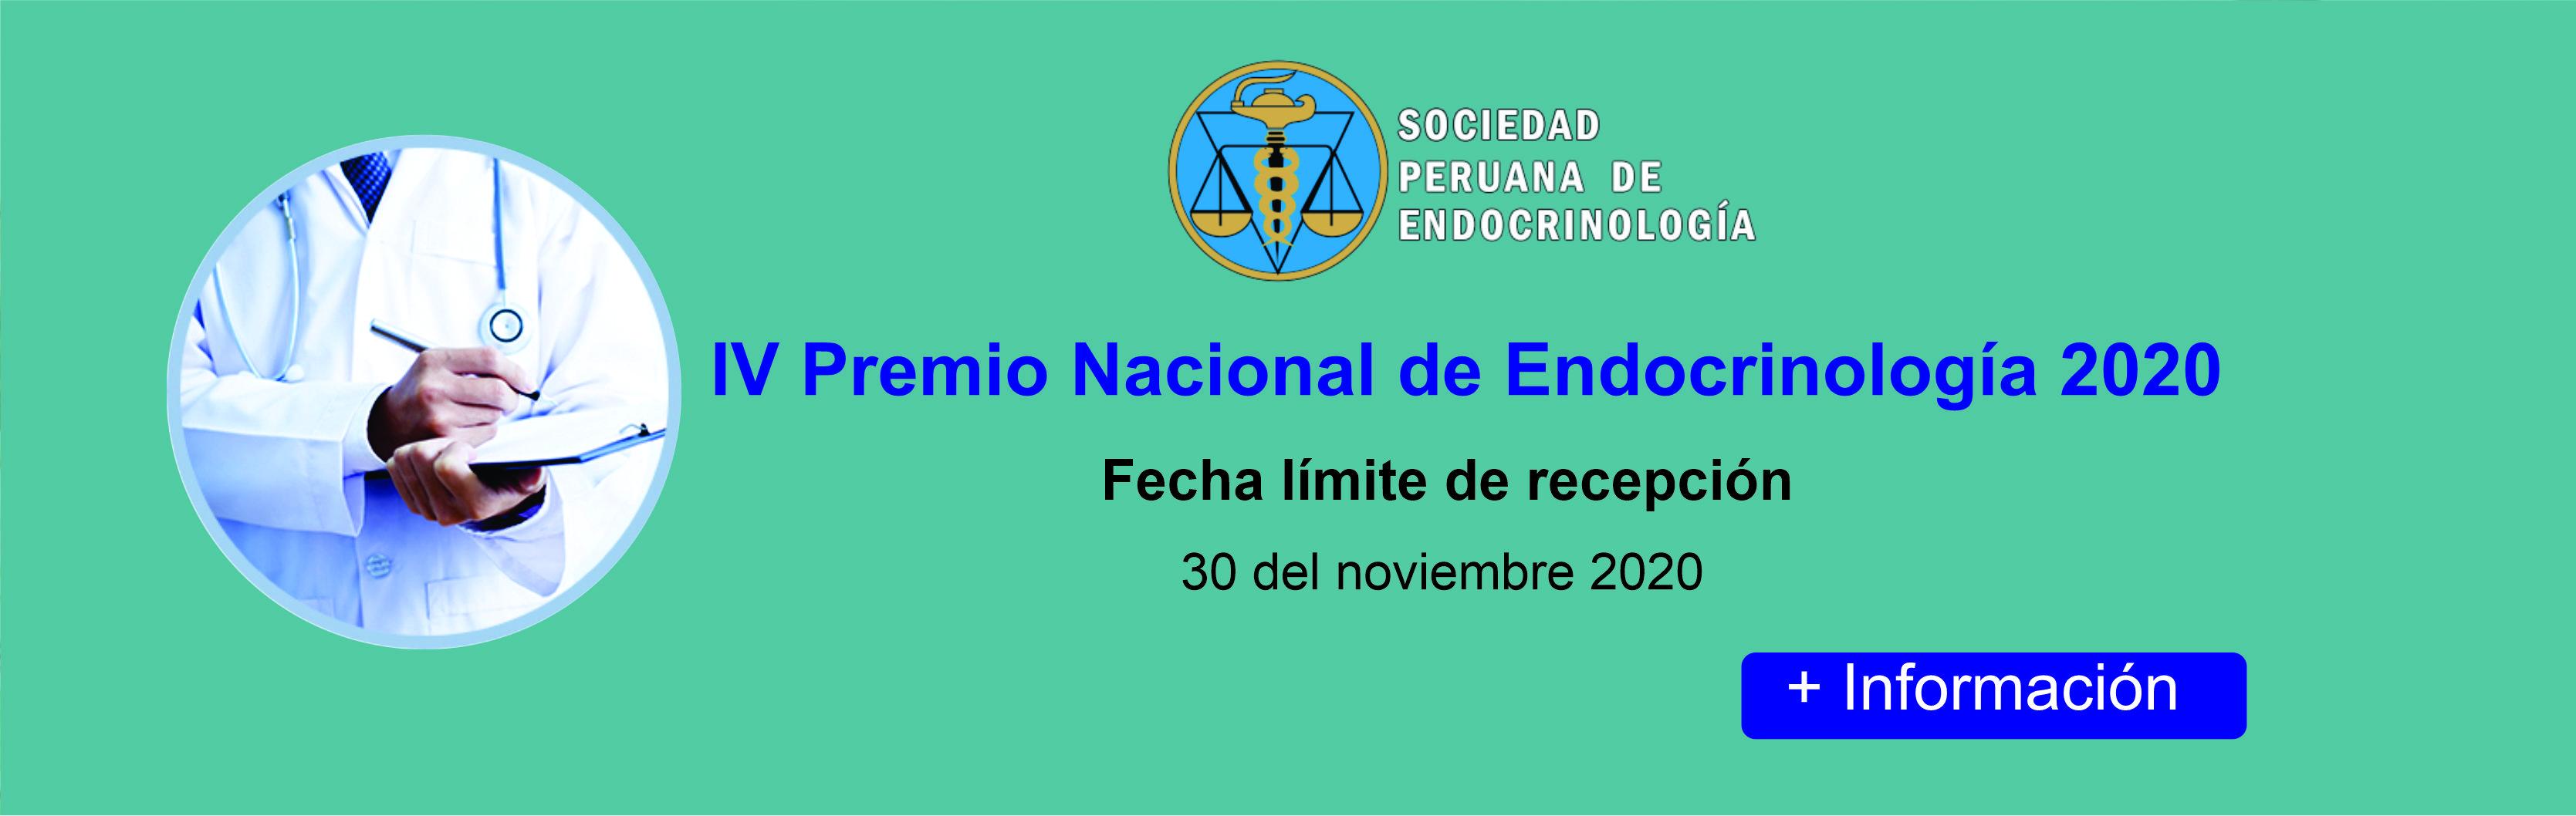 premio-nacional-endocrinologia-2020.jpg